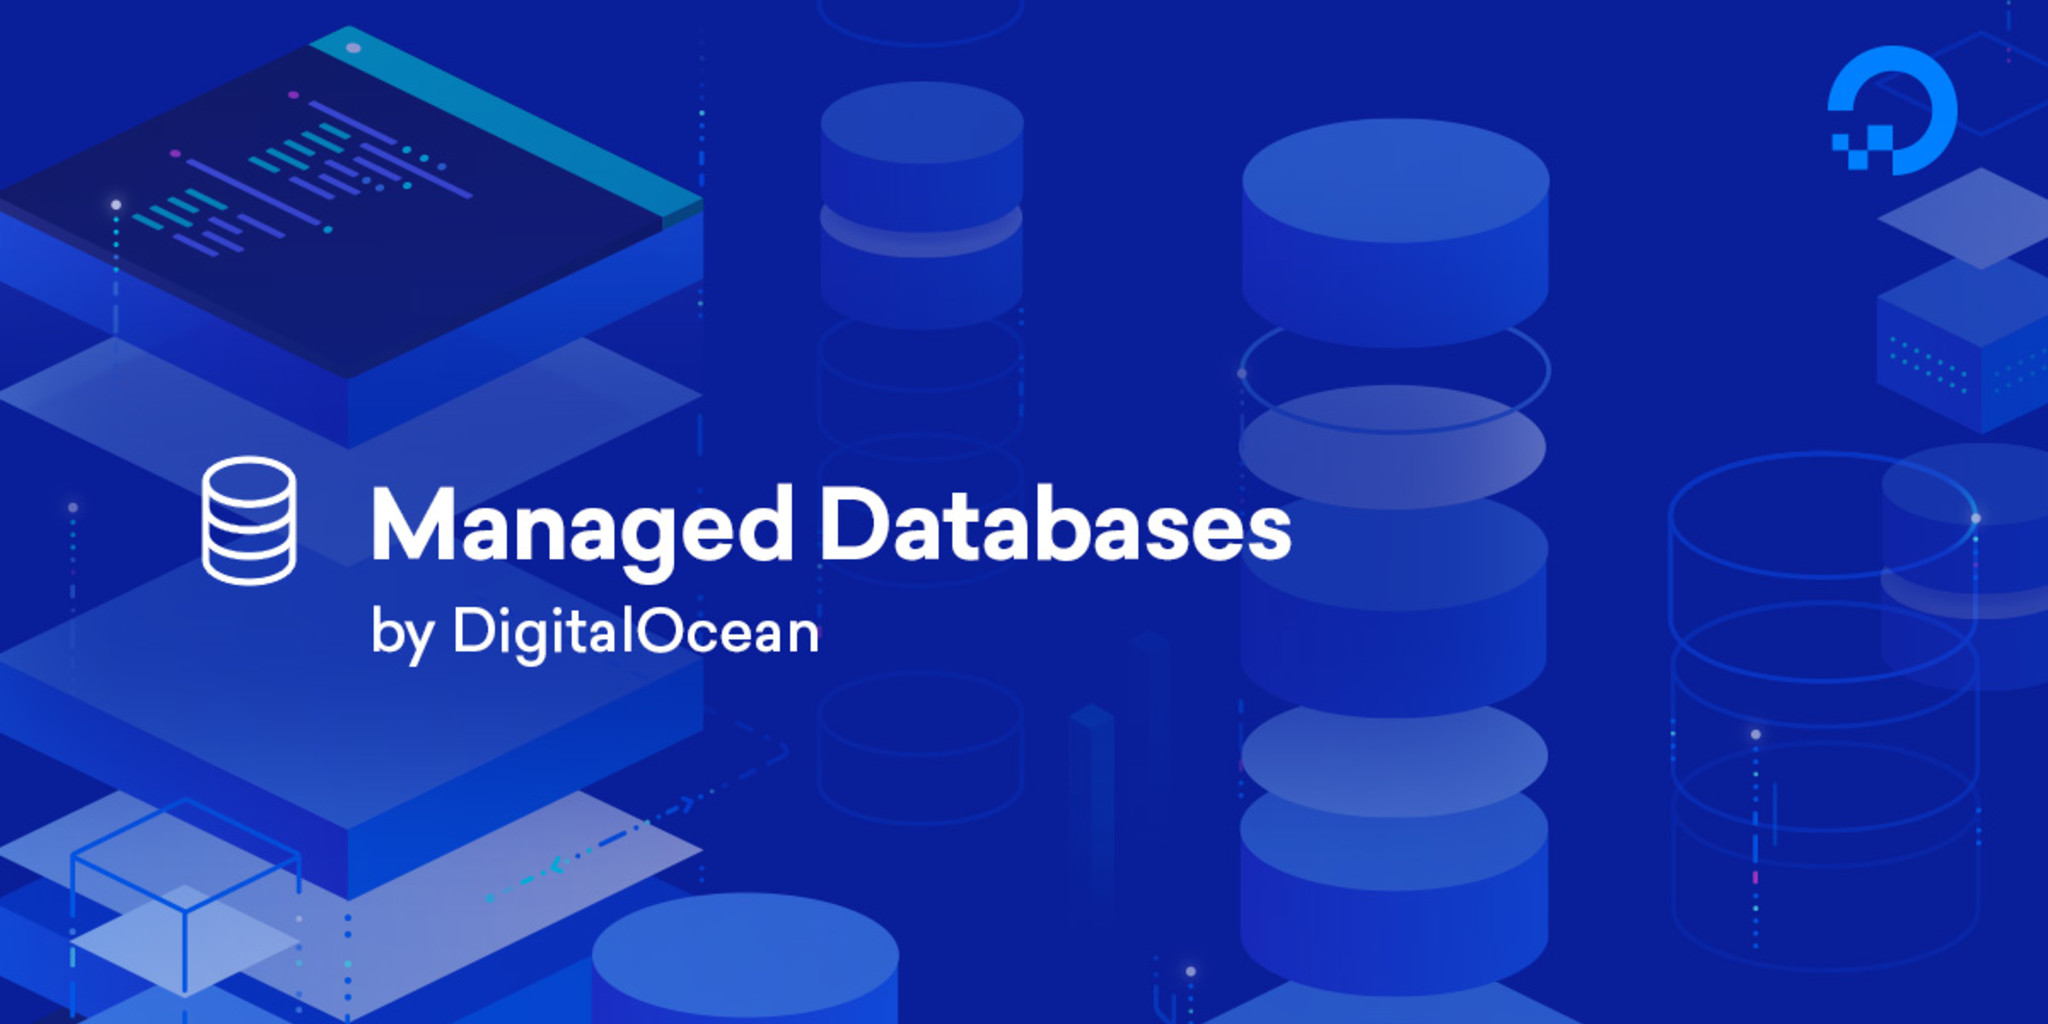 Managed Databases on DigitalOcean